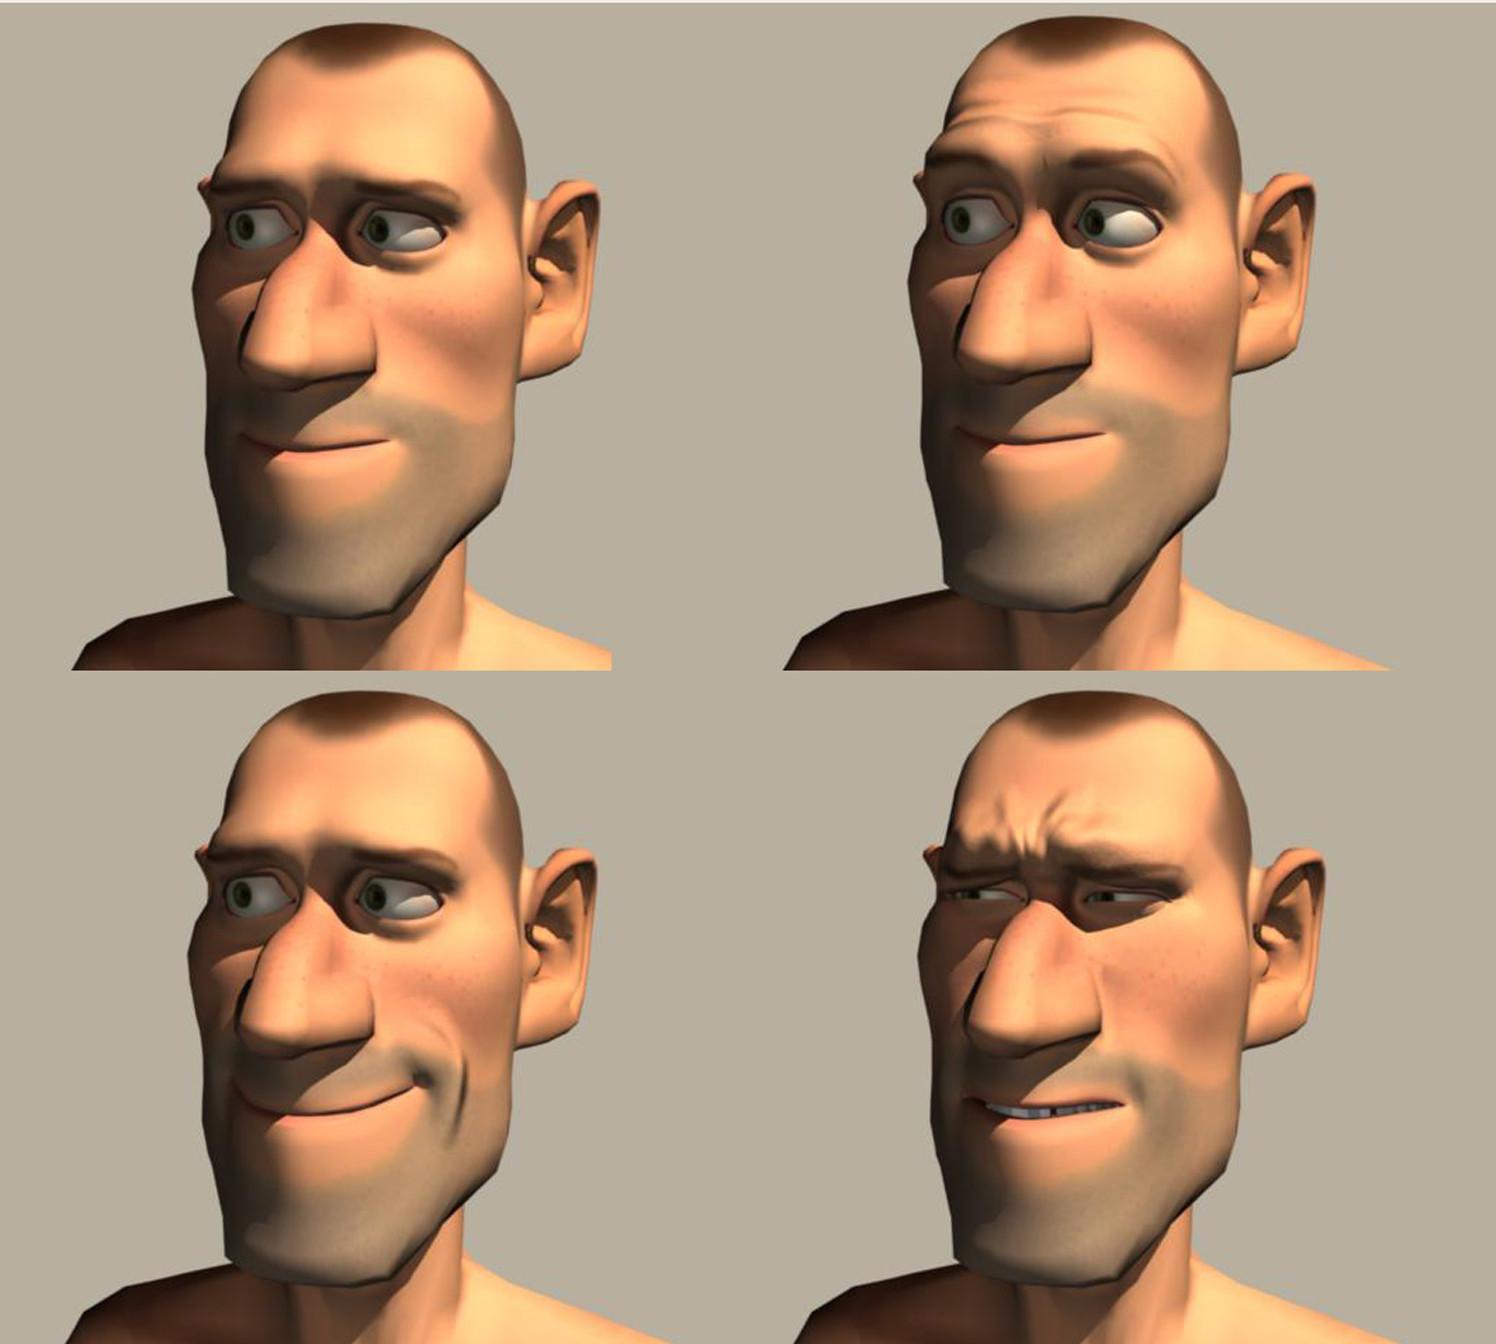 Rodolfo damaggio goose expressions